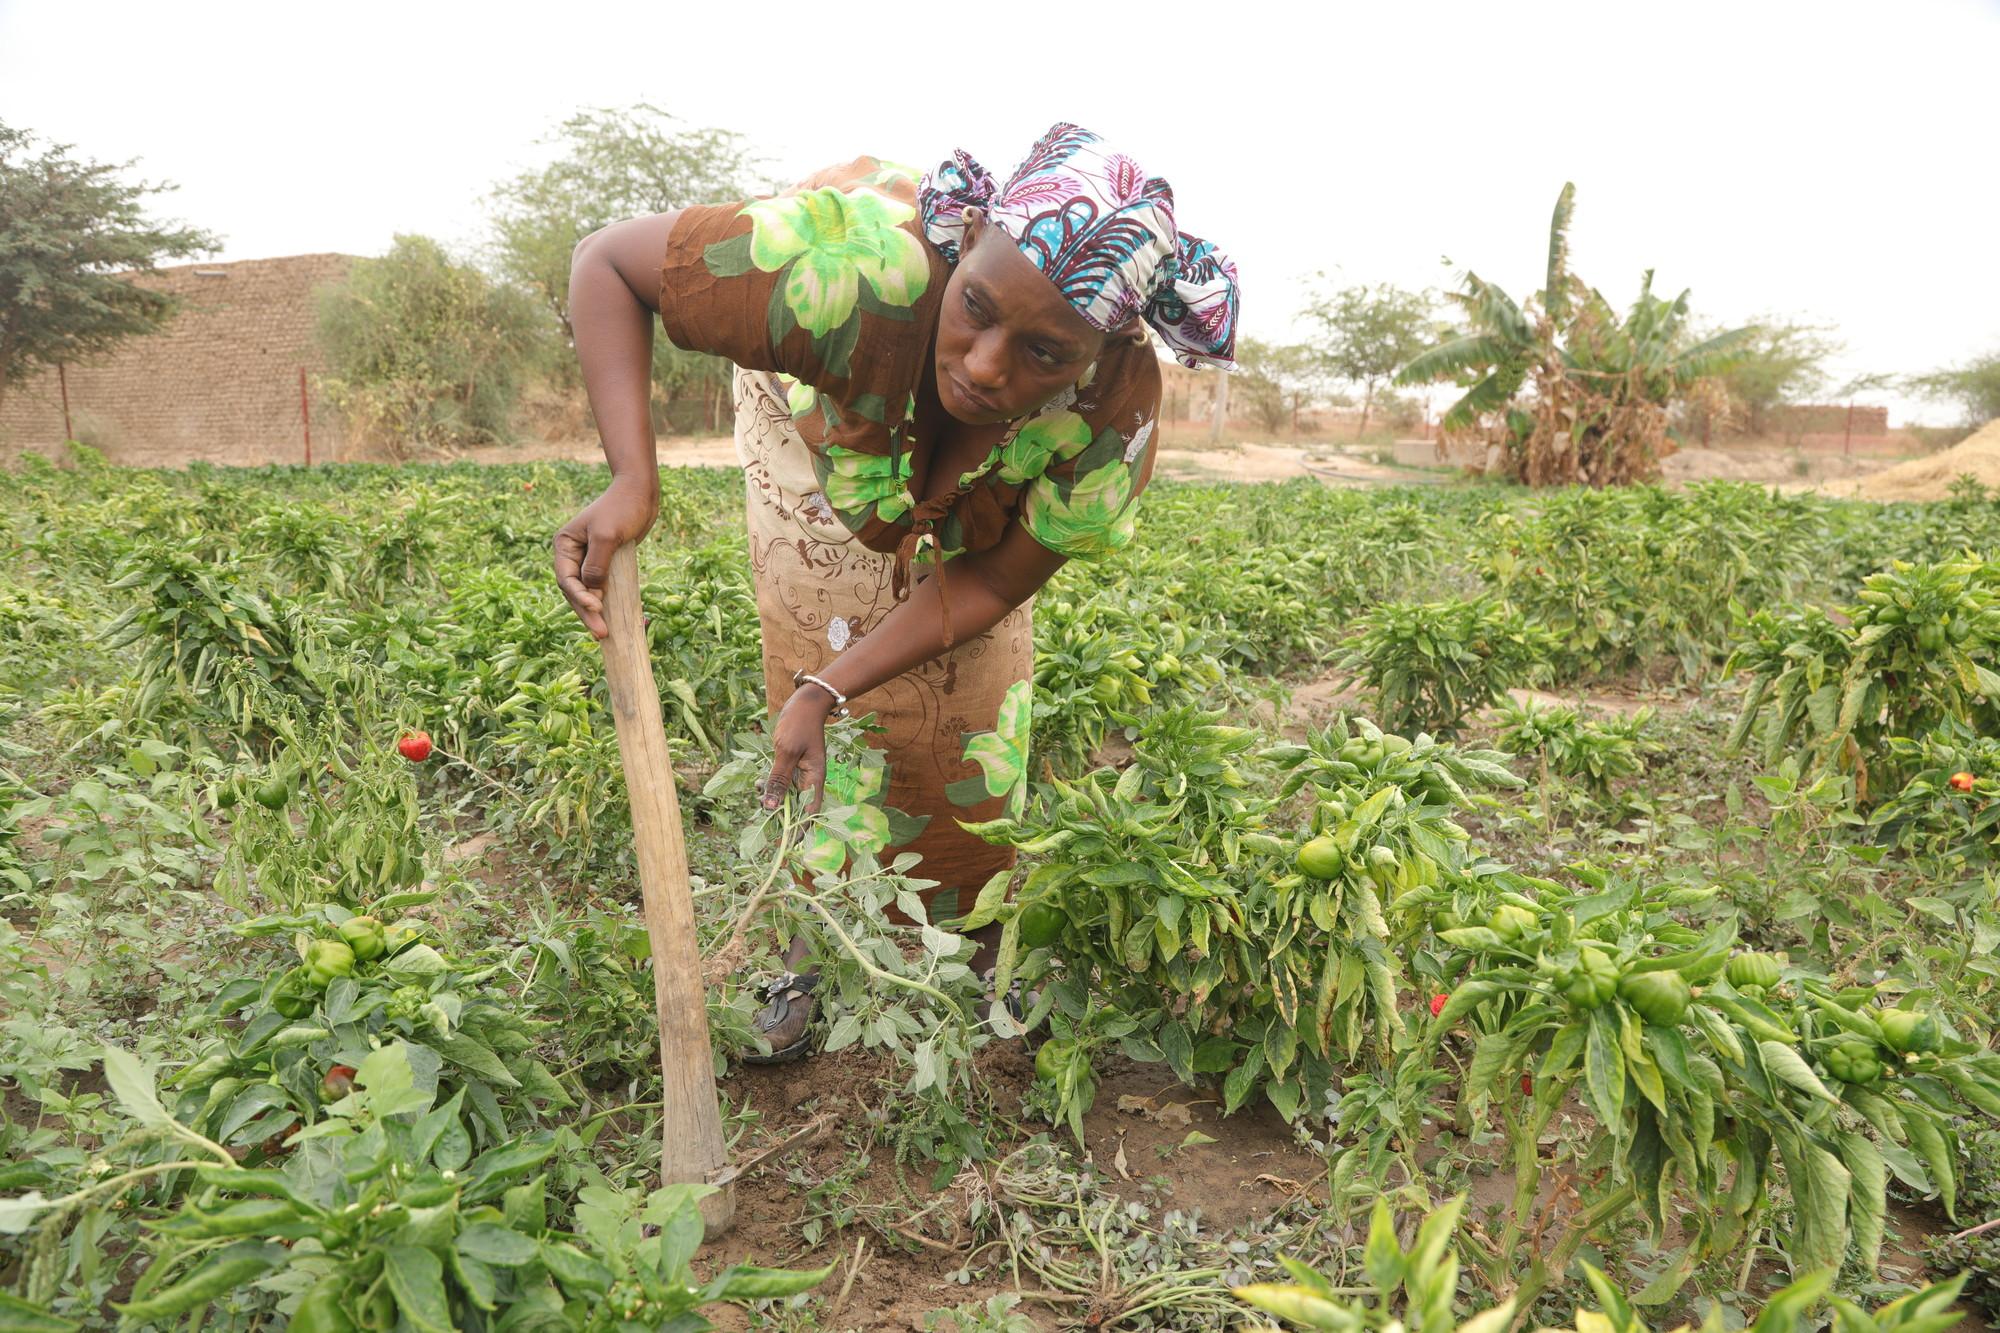 A woman farms crops in a field.